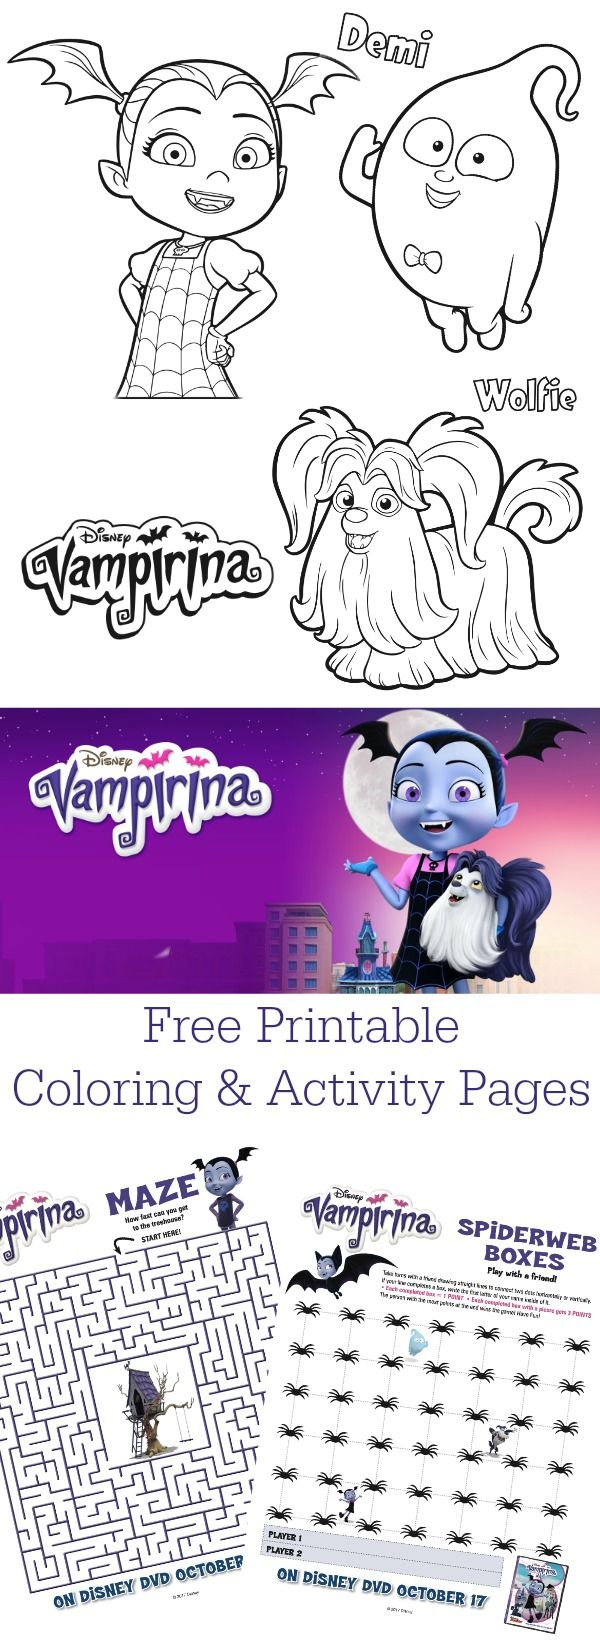 Download Free Printable Disney Junior Vampirina Coloring Pages Fun Activity Sheets Enter T Disney Junior Birthday Disney Junior Birthday Party Disney Junior